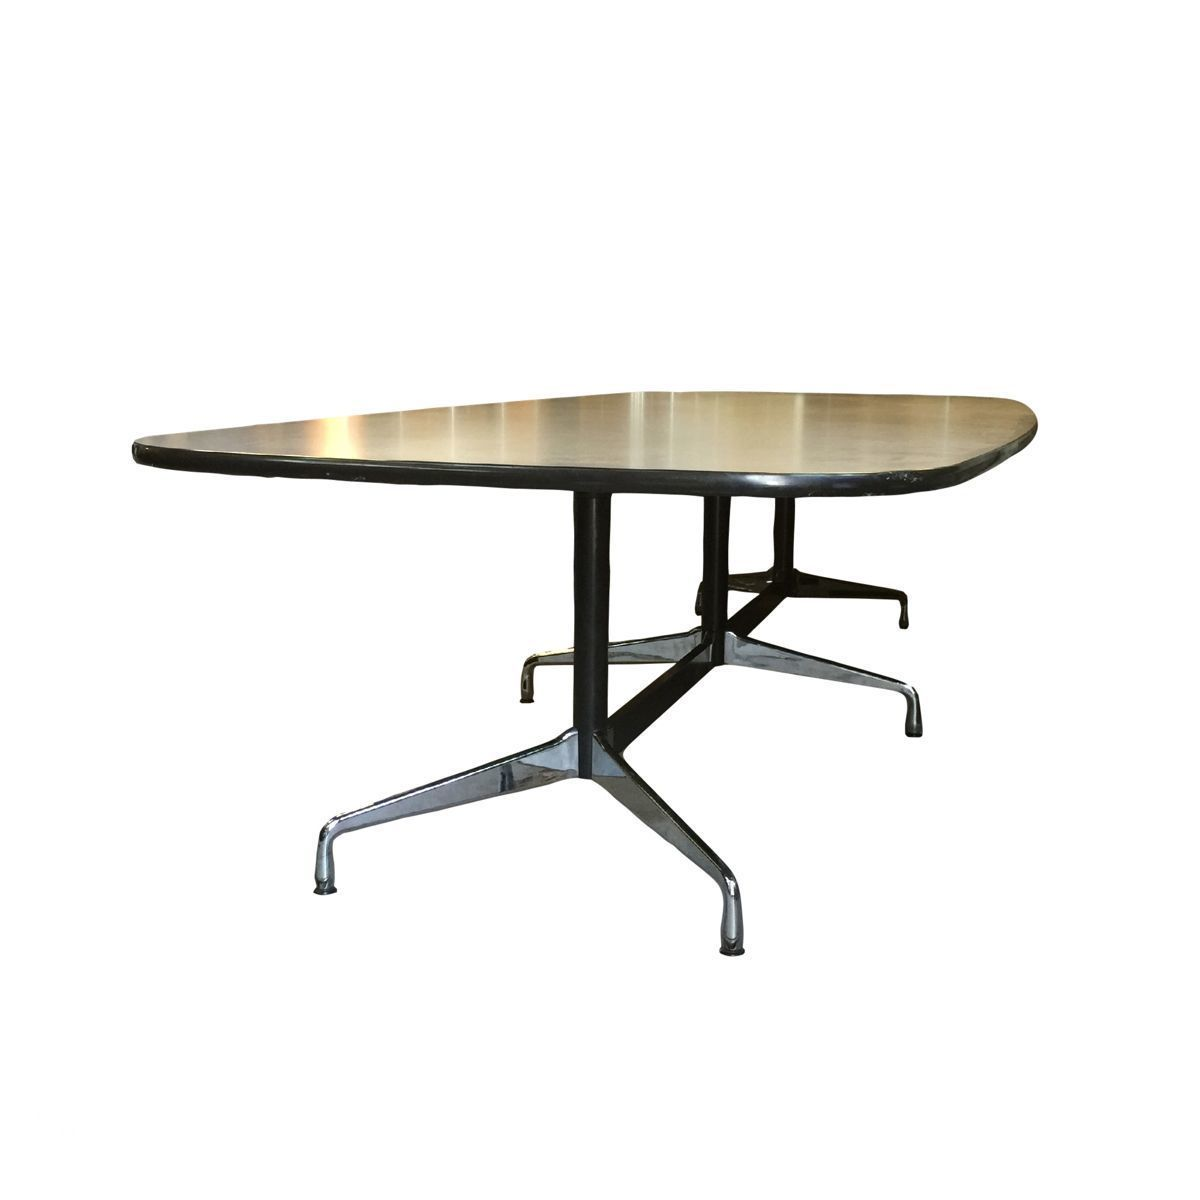 Vintage grote eames tafel ztijl - Eames meubels ...